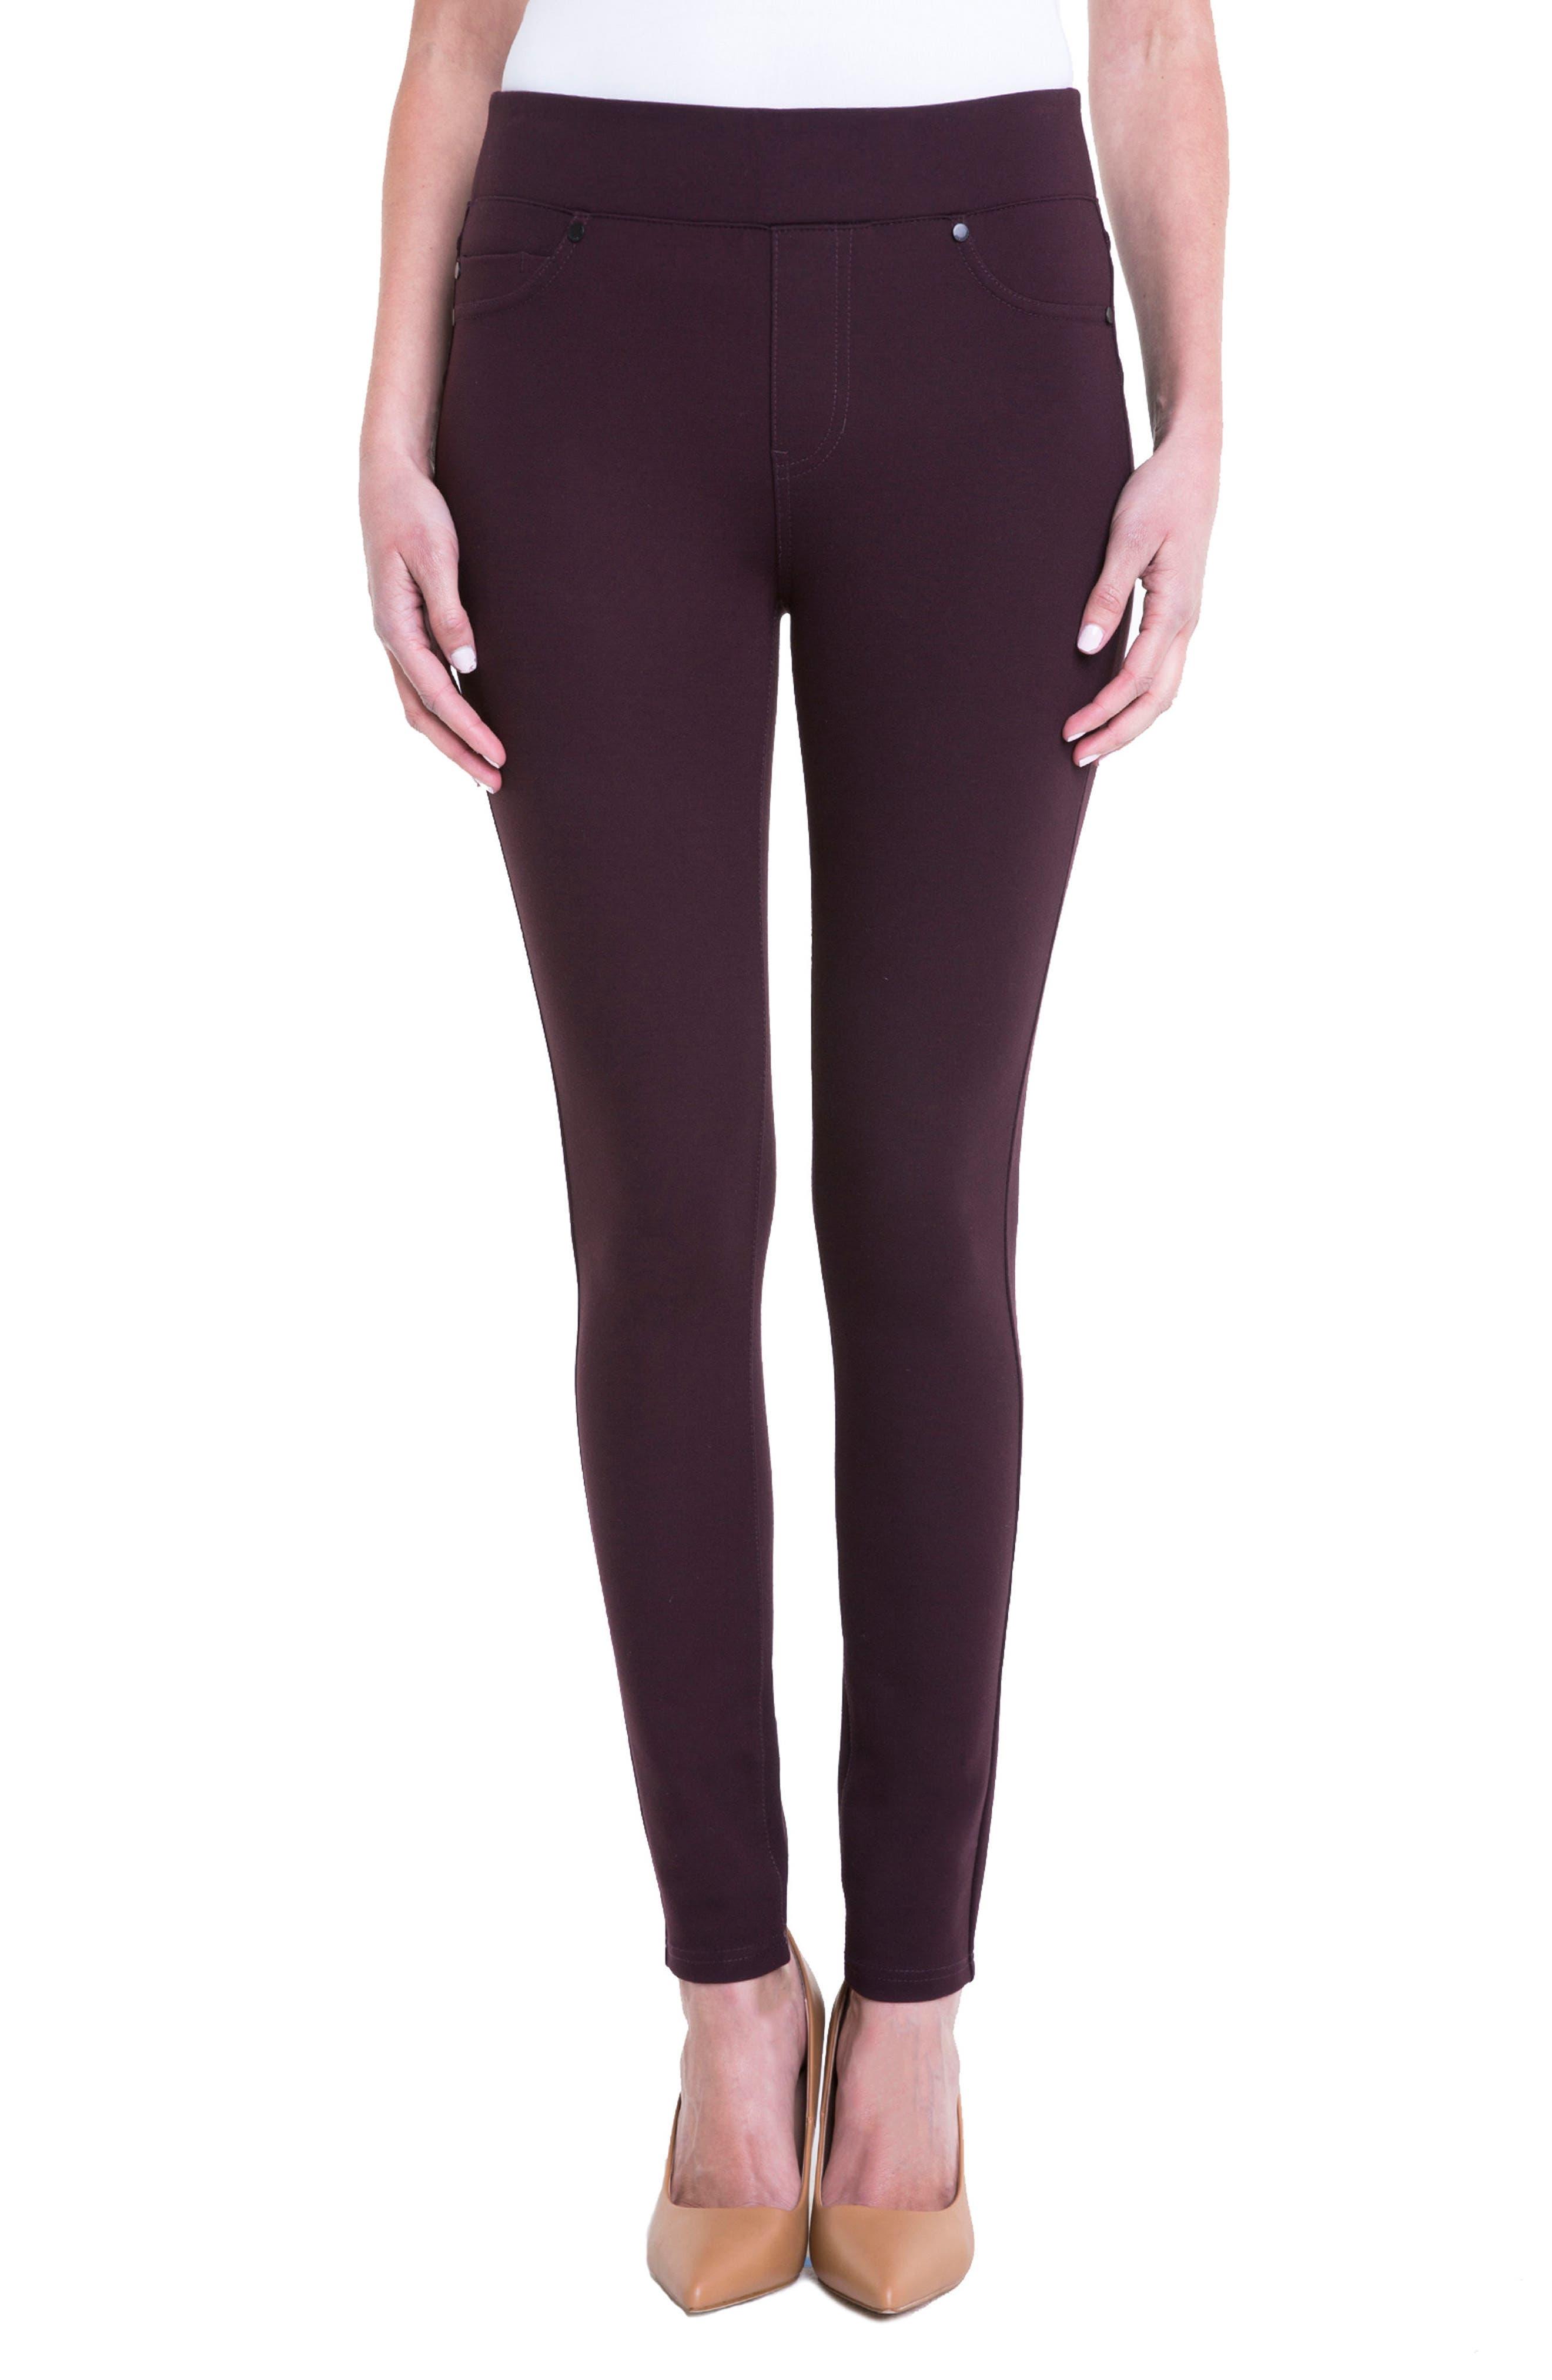 Liverpool Jeans Company Piper Hugger Leggings (Aubergine)